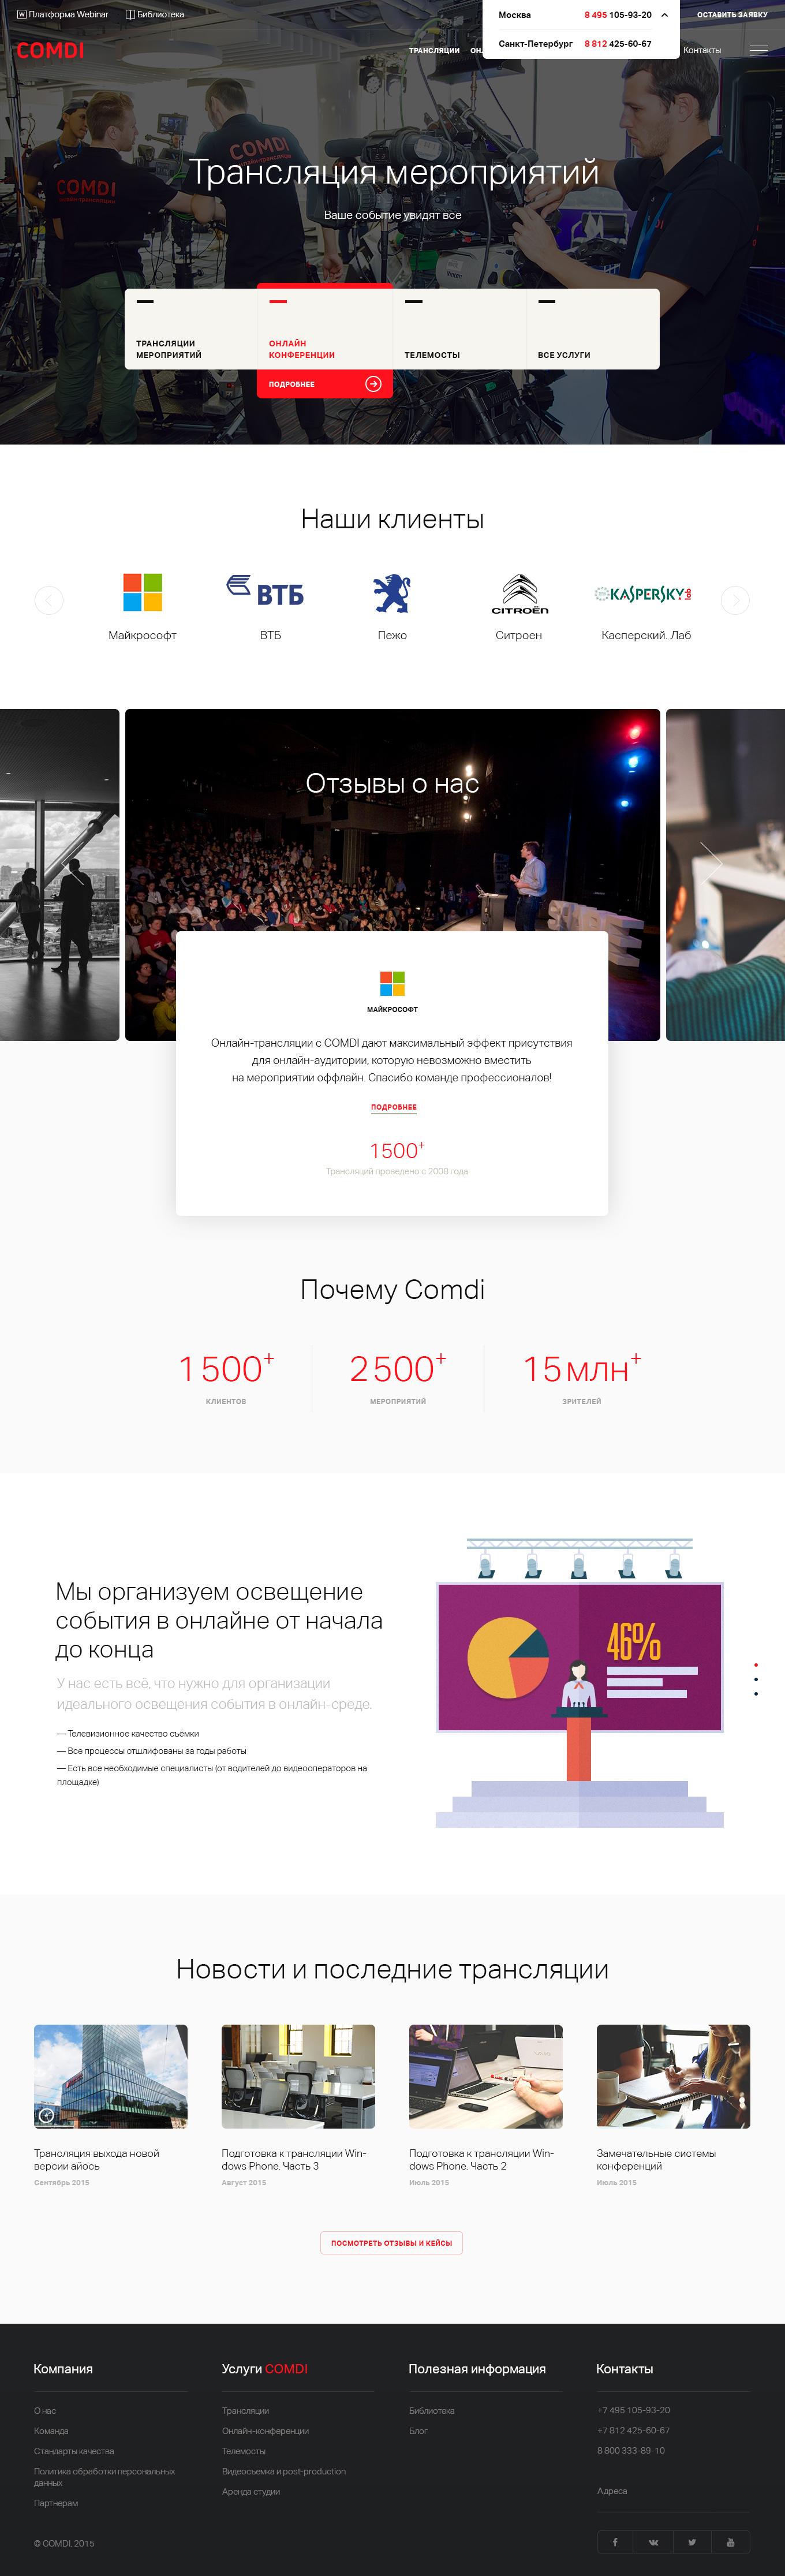 comdi_homepage